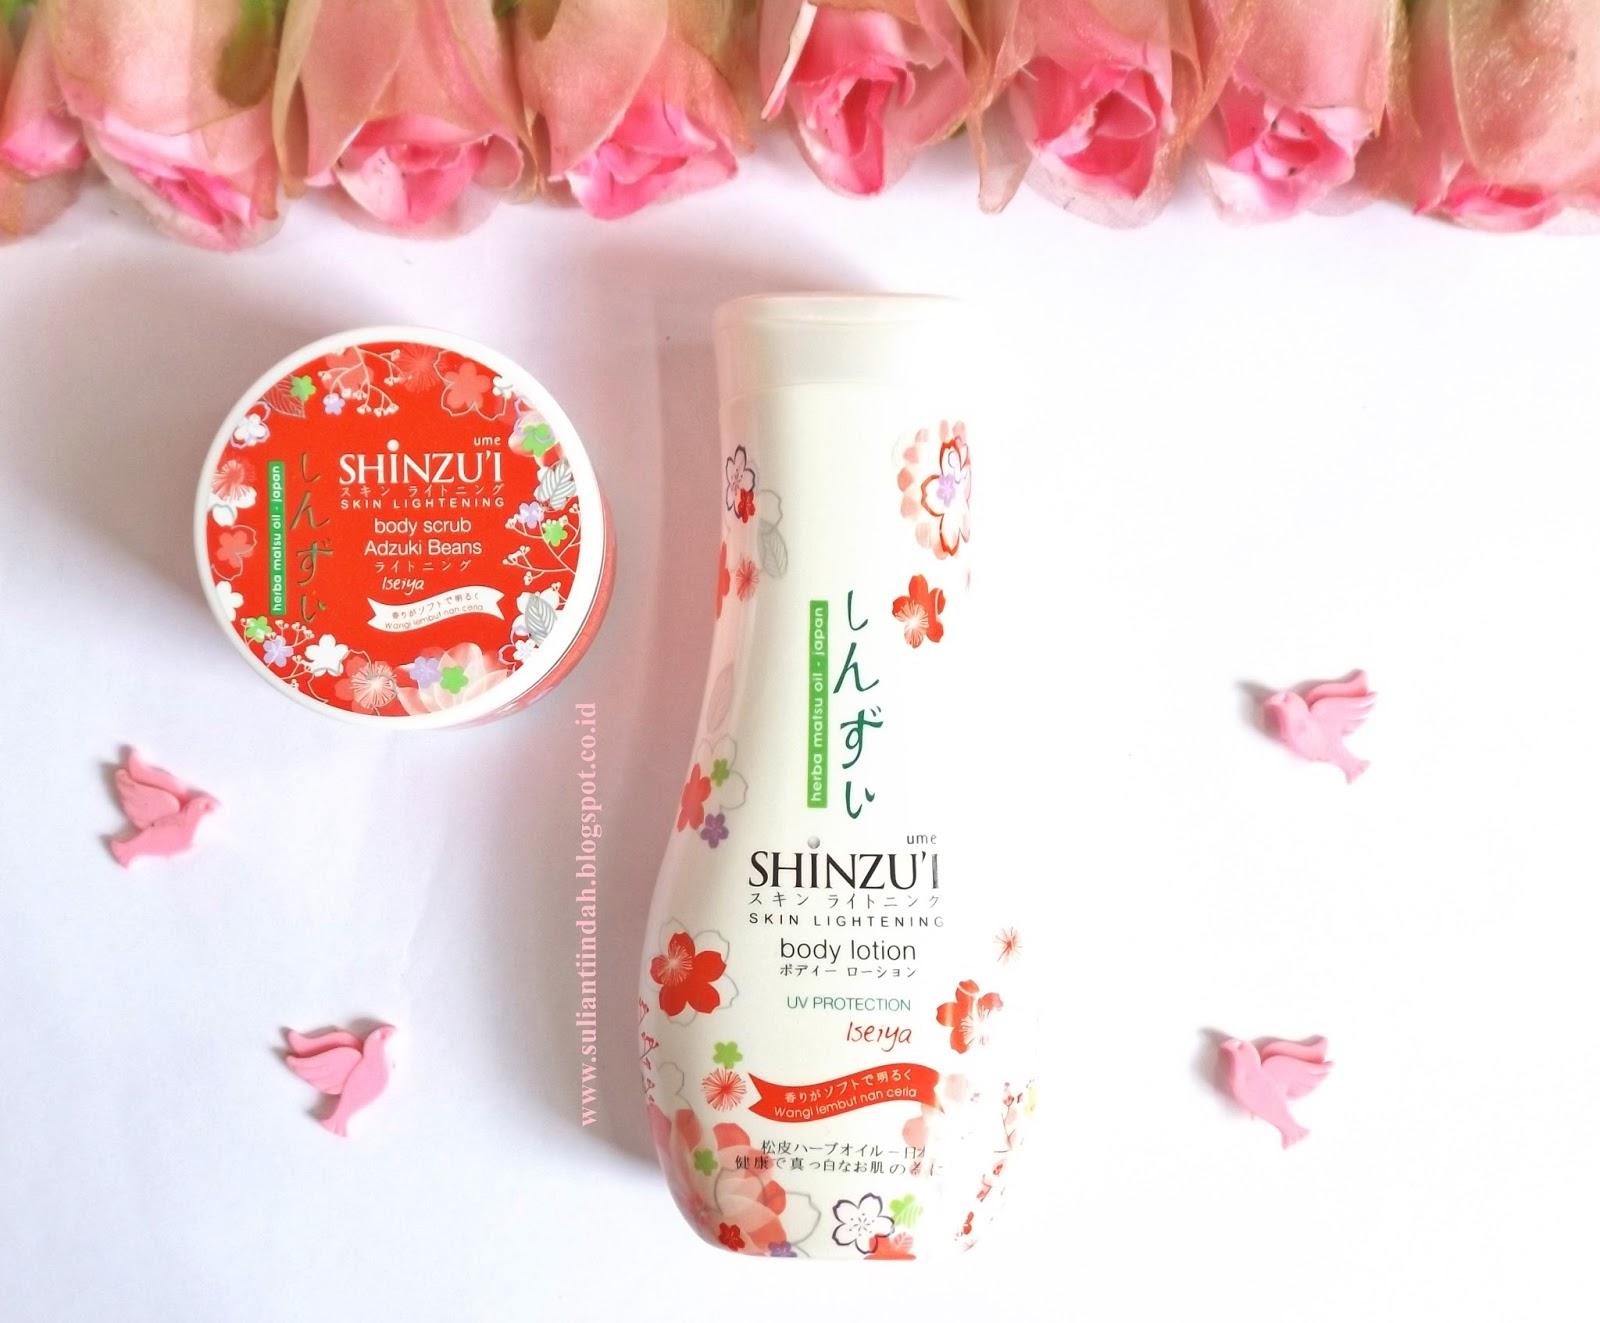 Before After My Beauty Secrets Shinzui Ume Body Scrub Adzuki Sabun Batang Beans Iseiya Dan Lotion